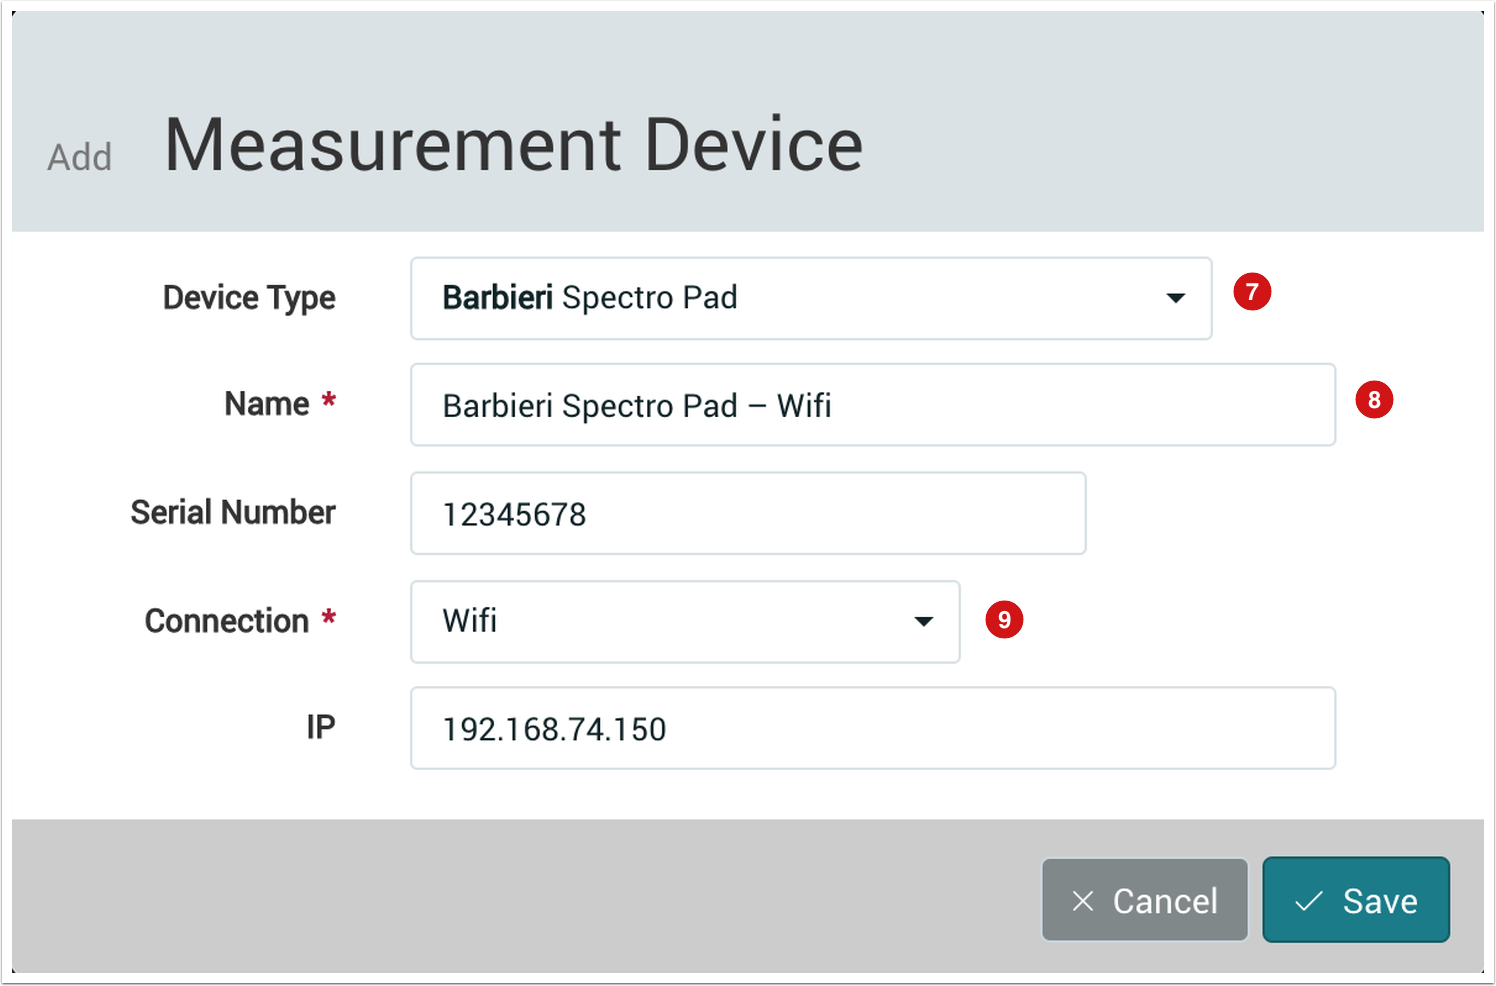 Add Measurement Device